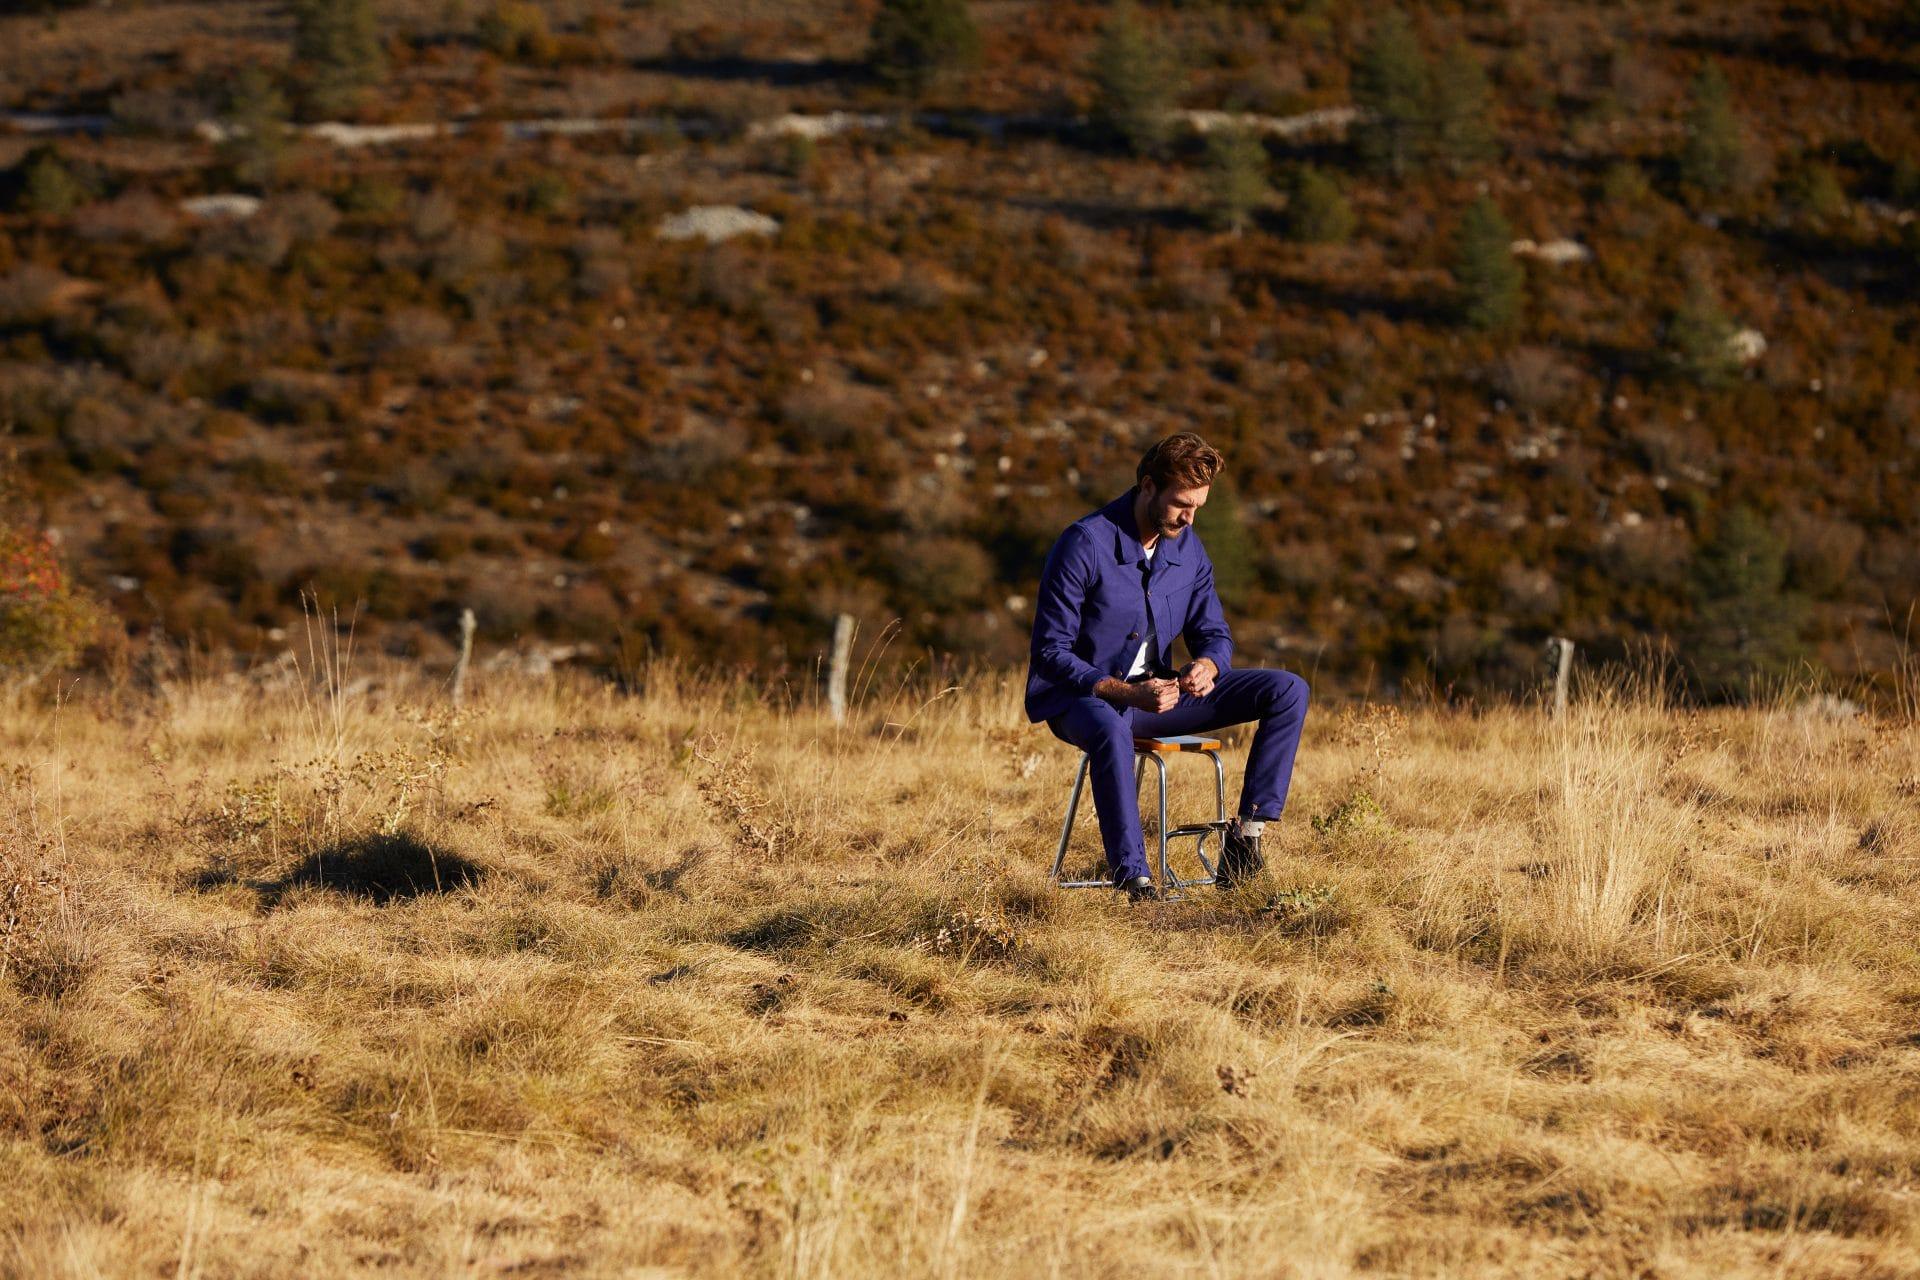 Veste Méjean homme Moleskine et pantalon jean homme Alphonse Moleskine - Lookbook #2